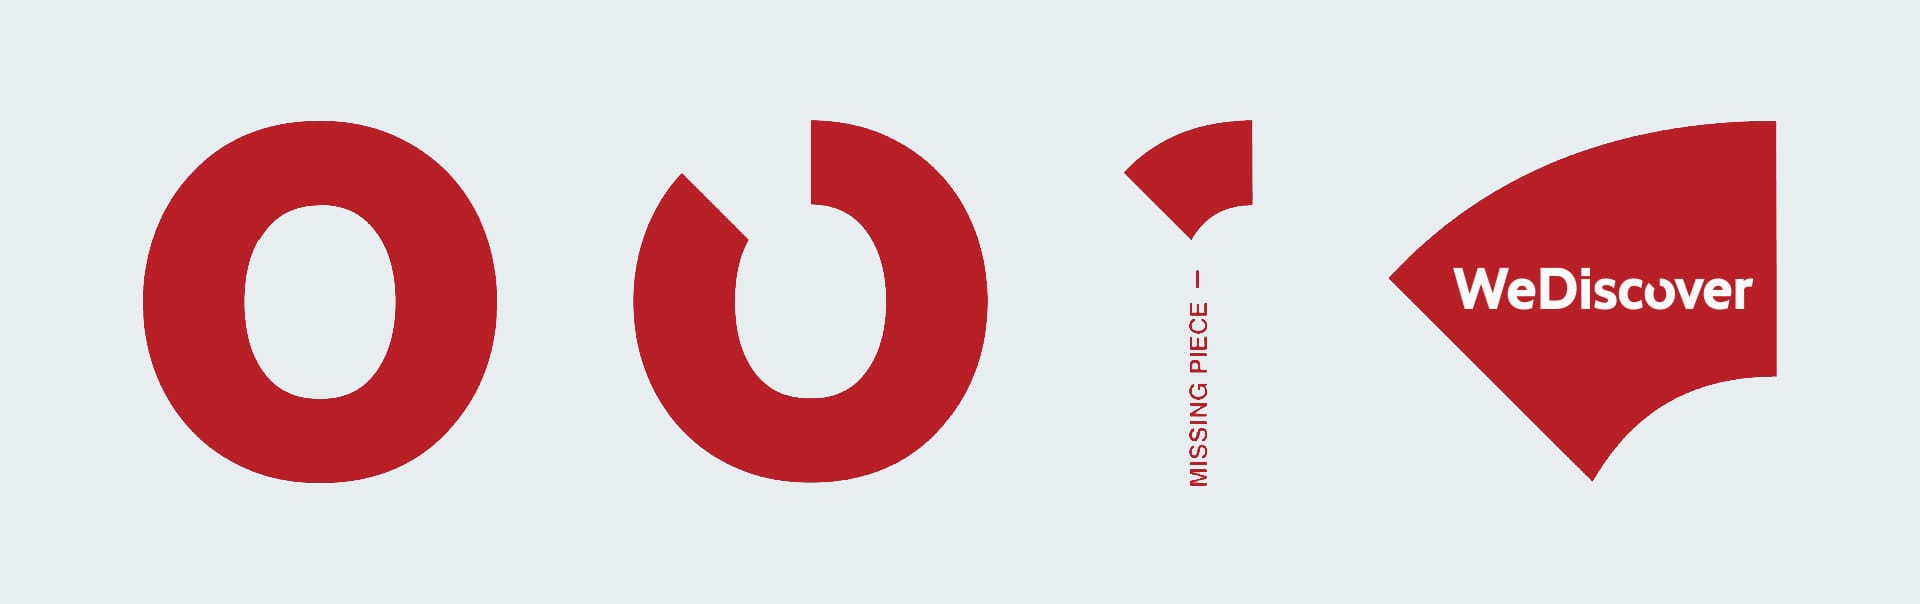 WeDiscover Logo Breakdown